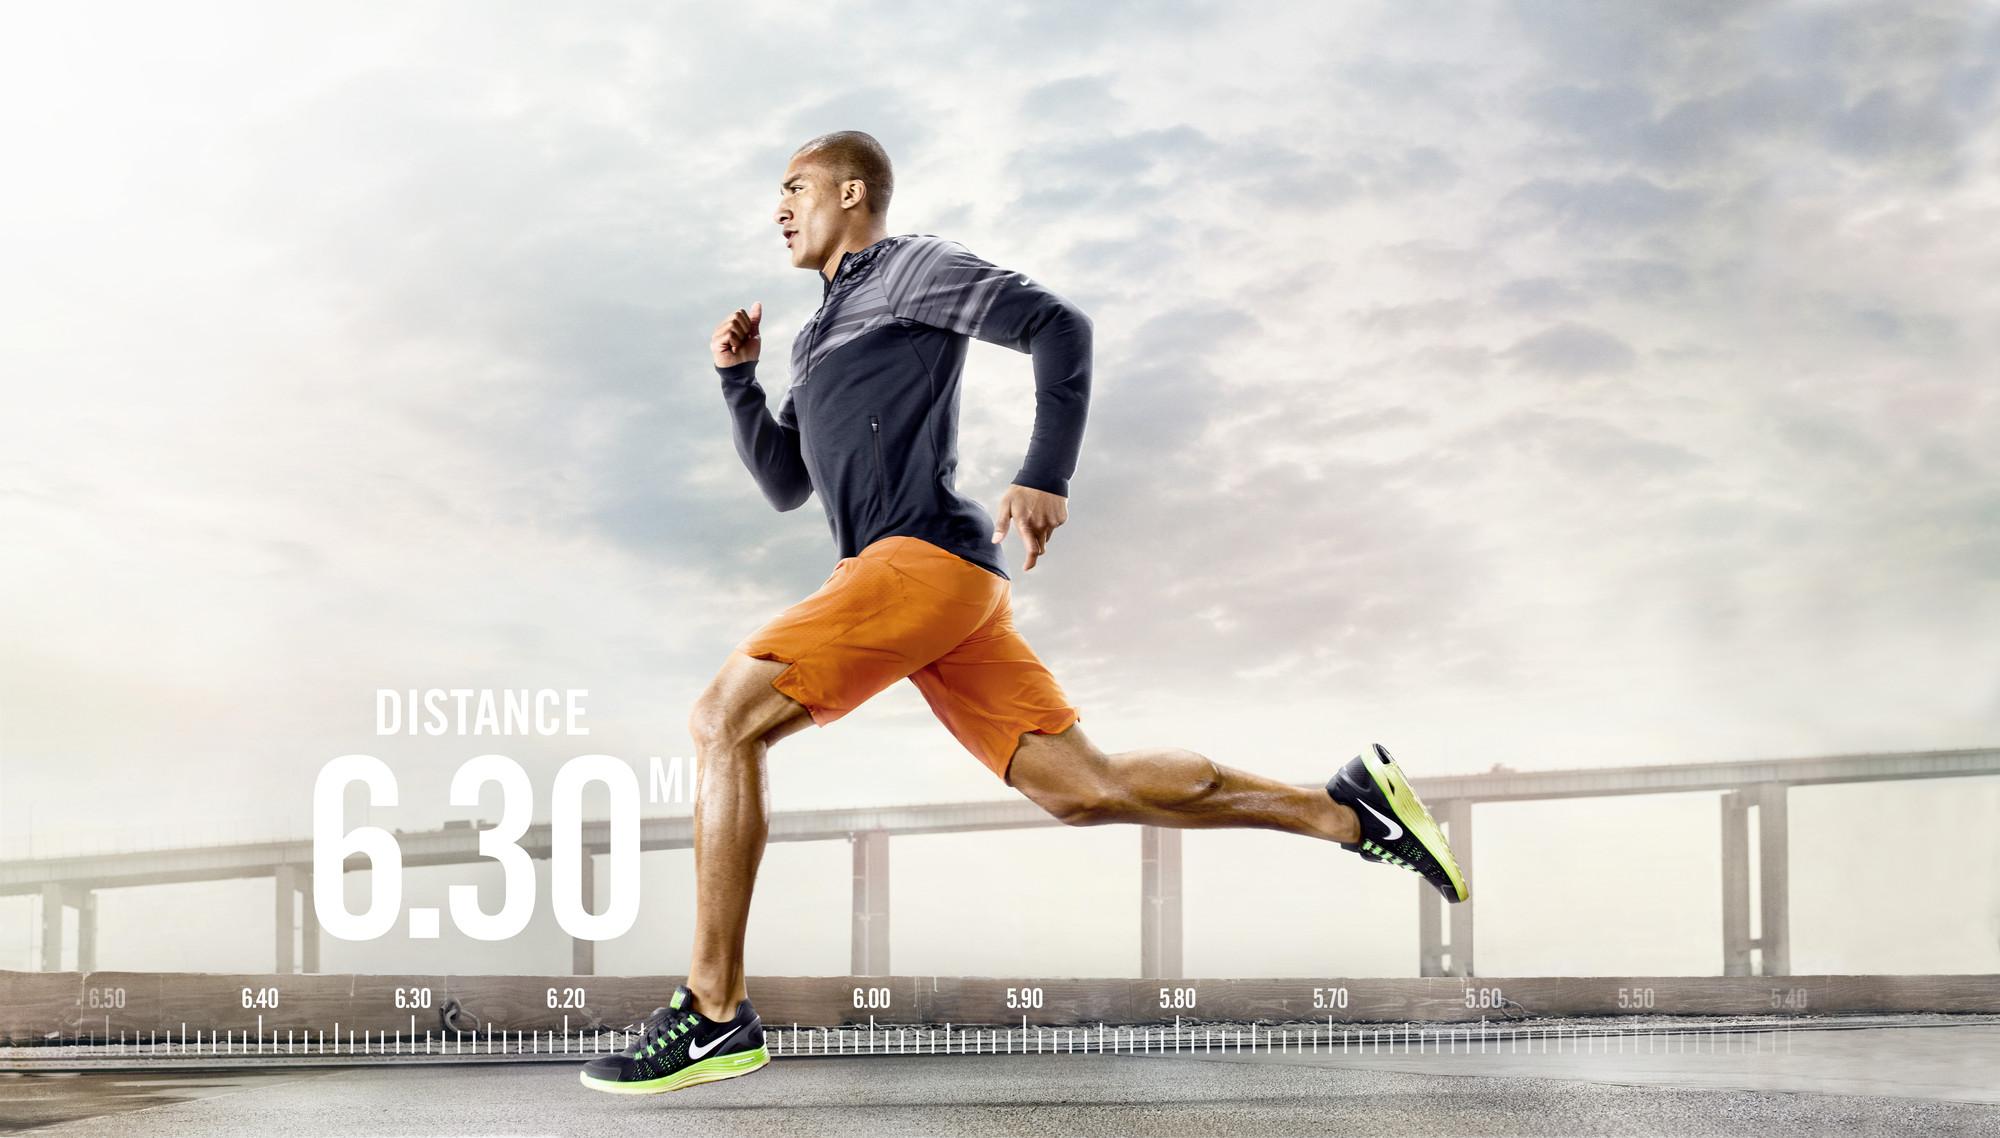 app Nike + running